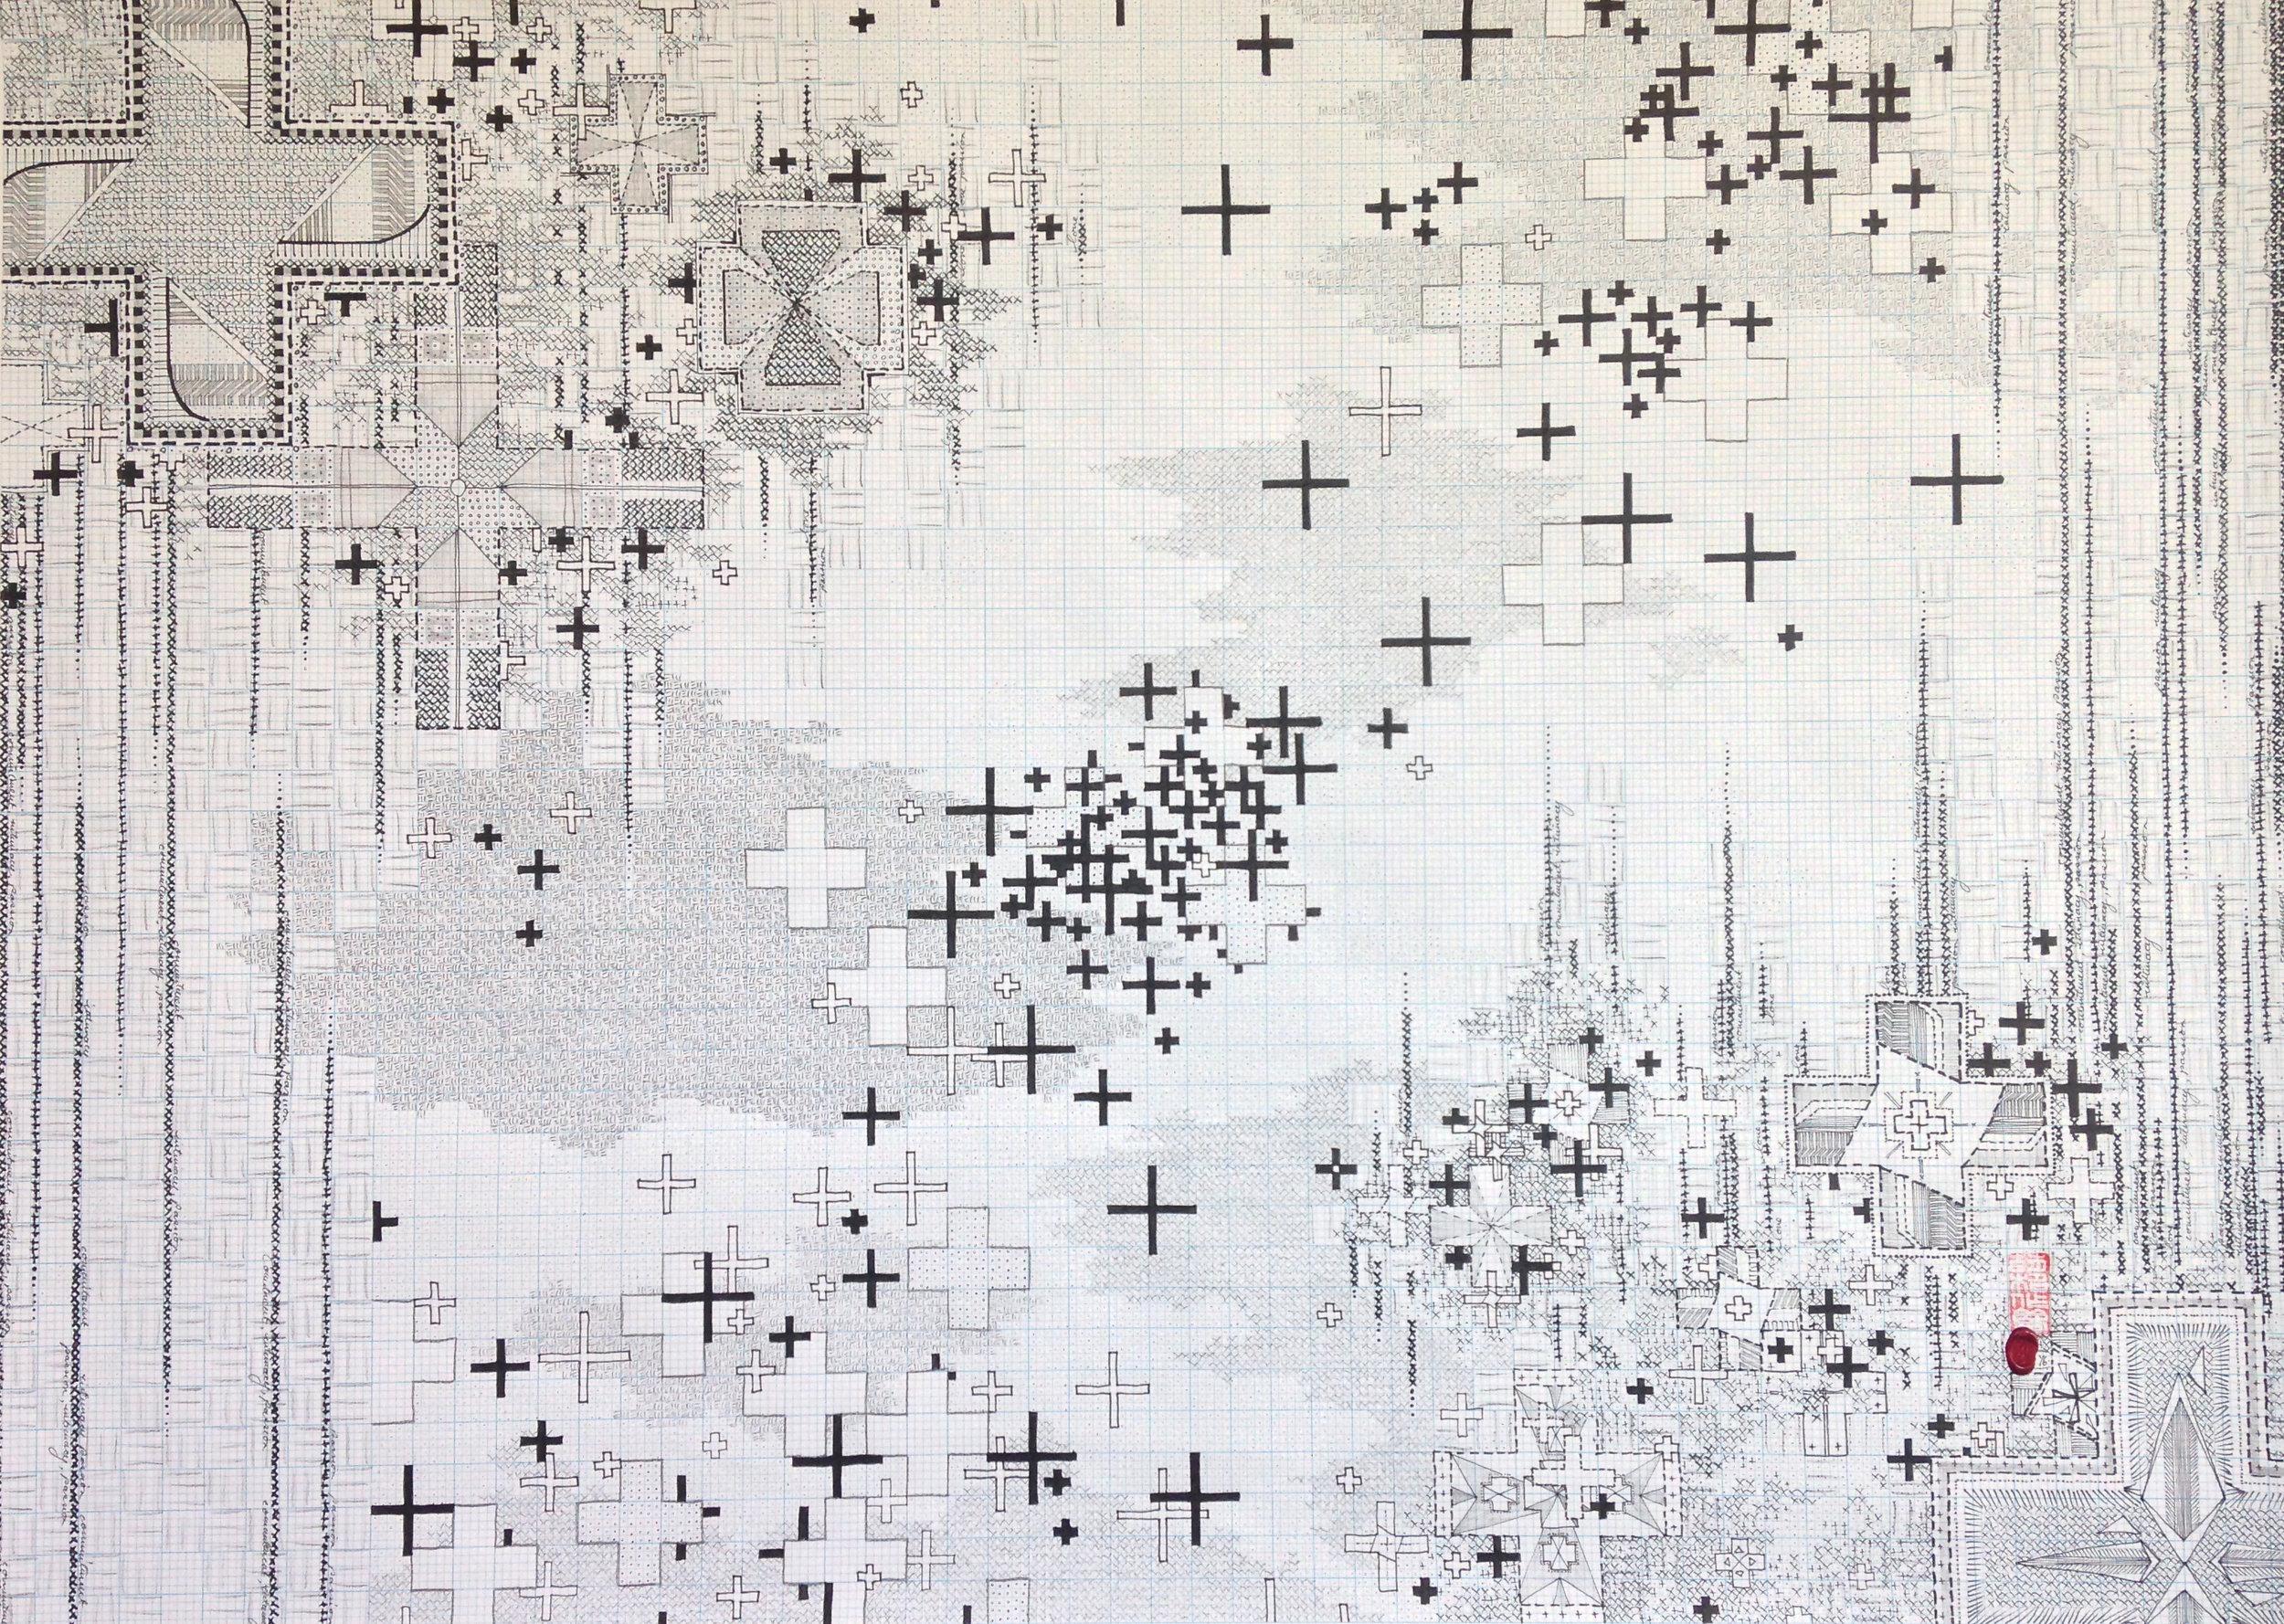 'Collective Conscious' , Black pigment liner, hanko signature & wax seal, 560 x 400mm, 1/1, 2016